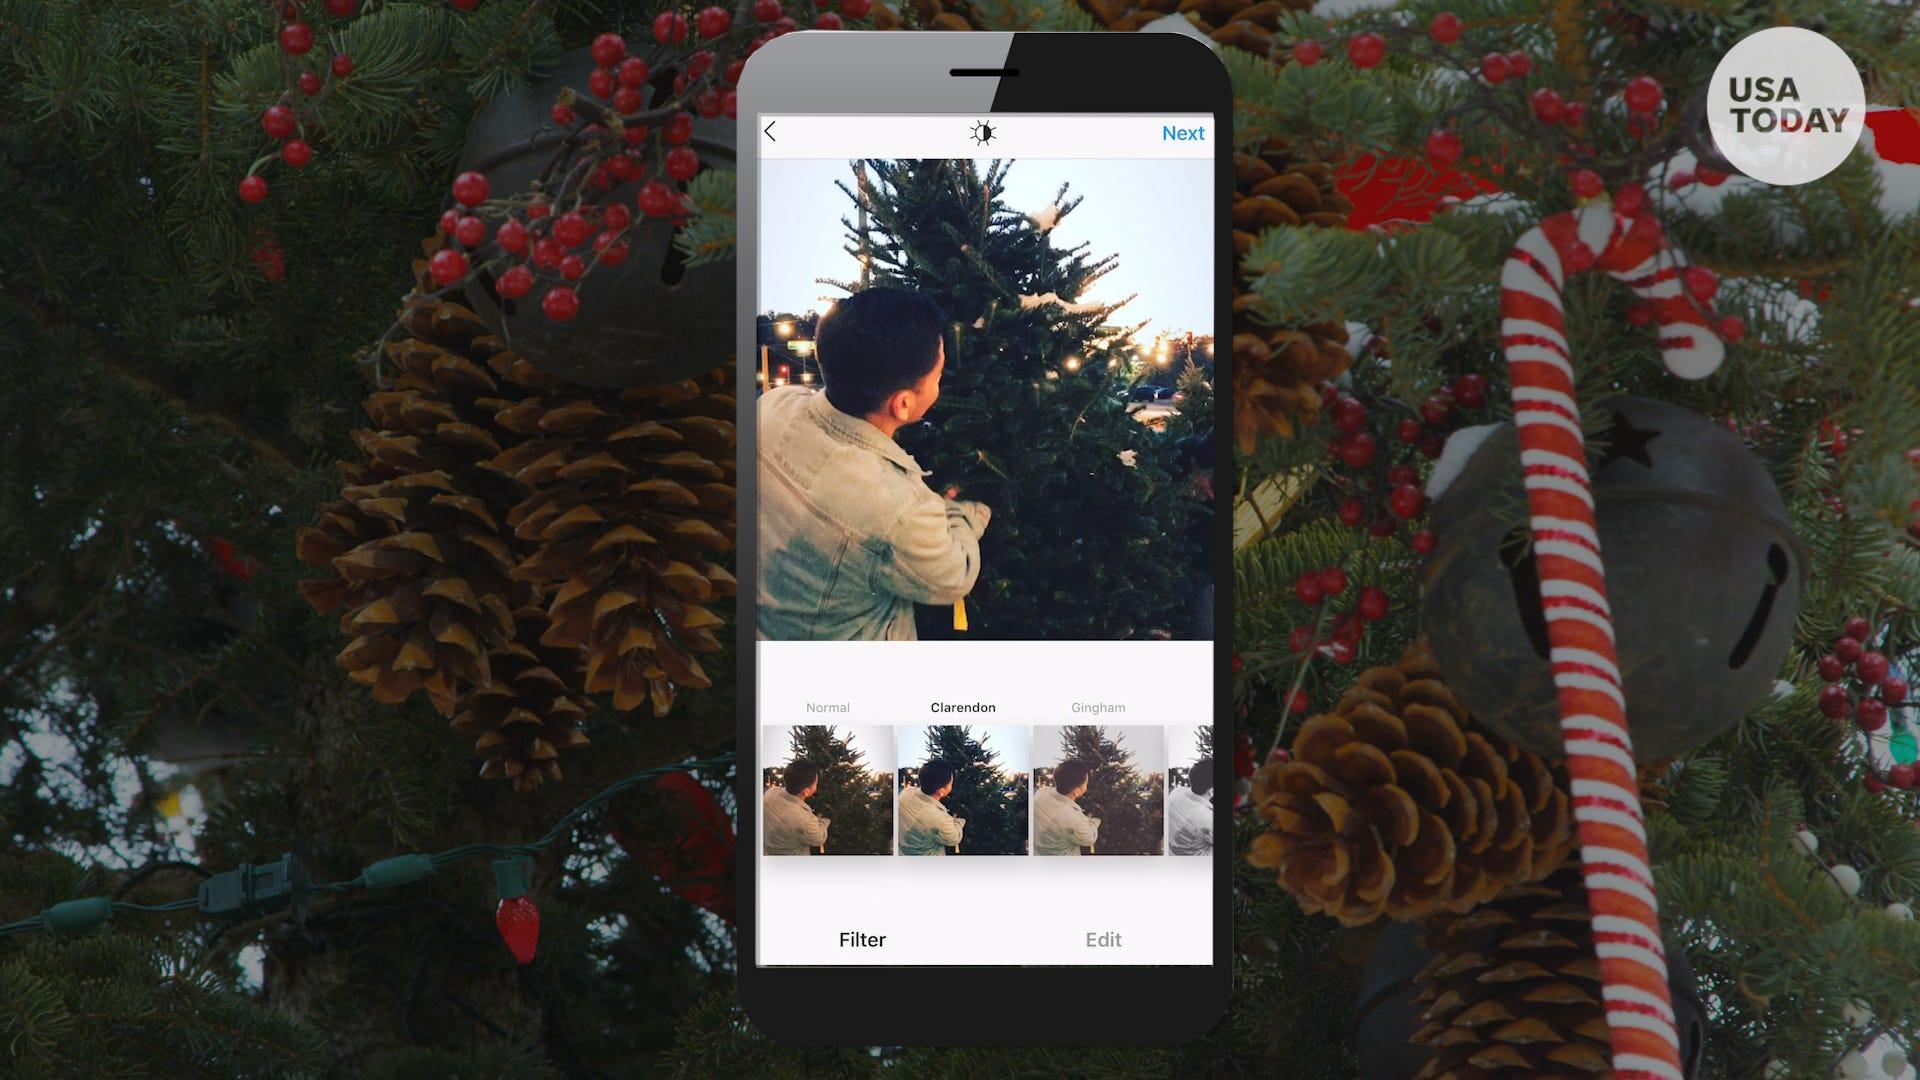 Christmas Trees Farms